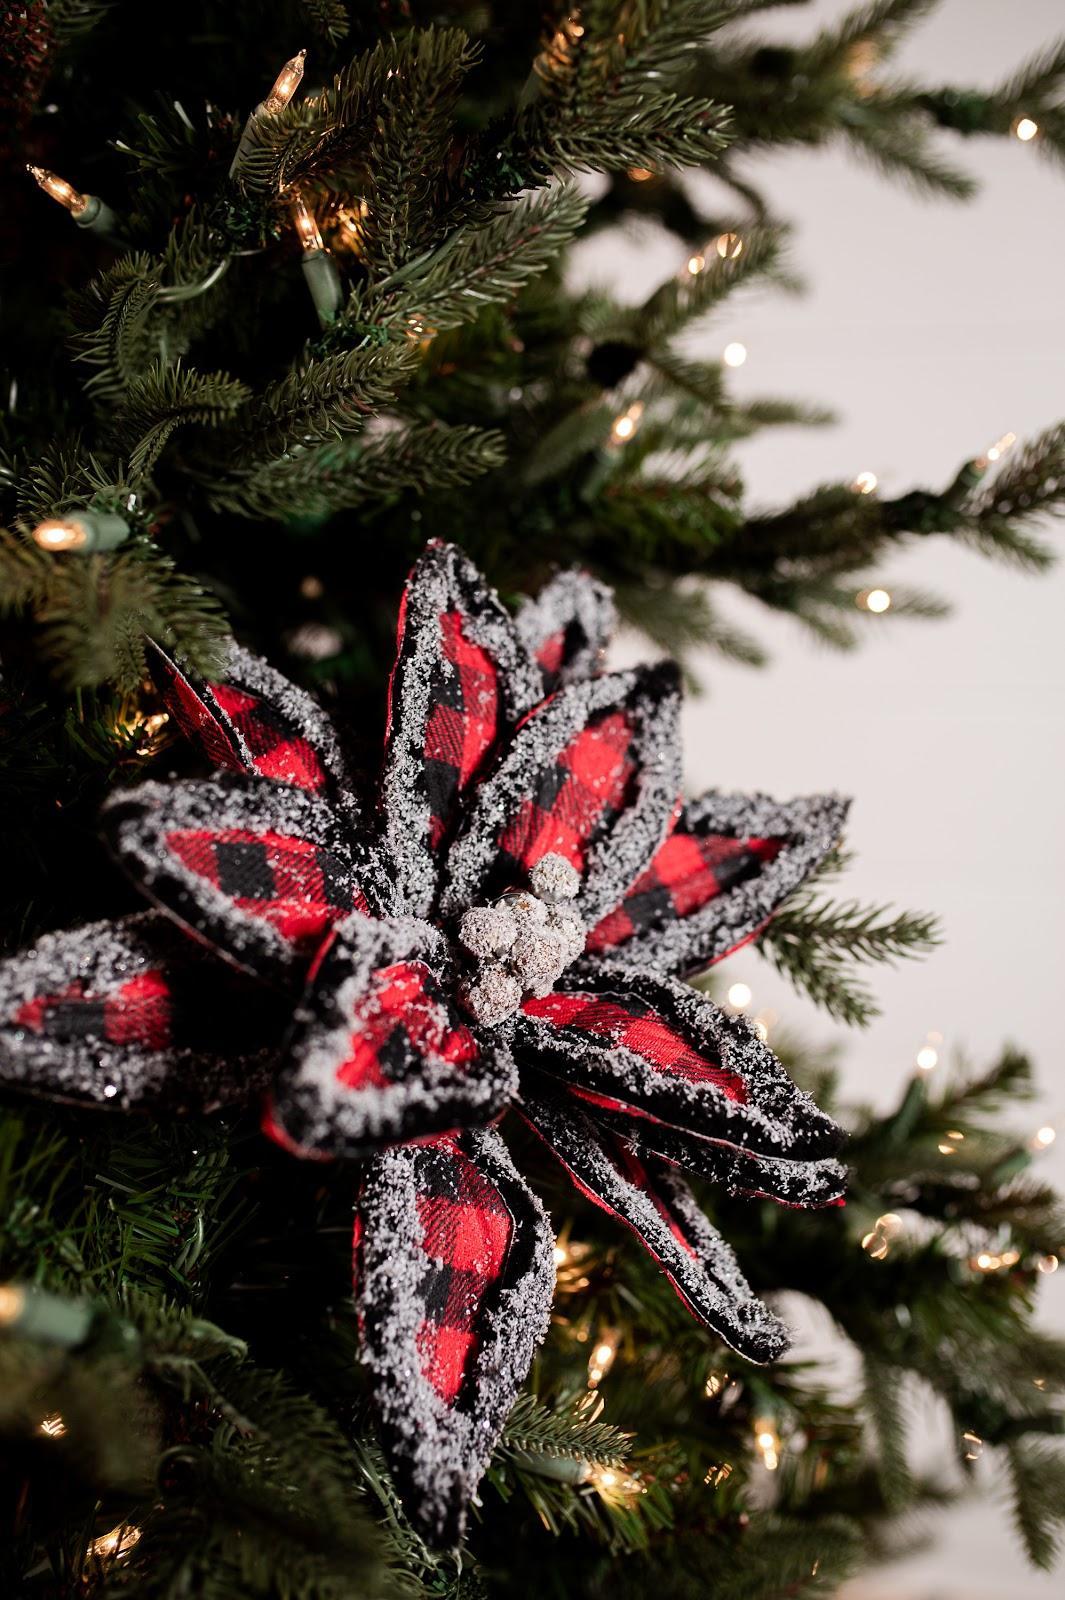 Christmas Decorating Trends 2020: Χριστουγεννιάτικος στολισμός δέντρου με καρό στολίδια